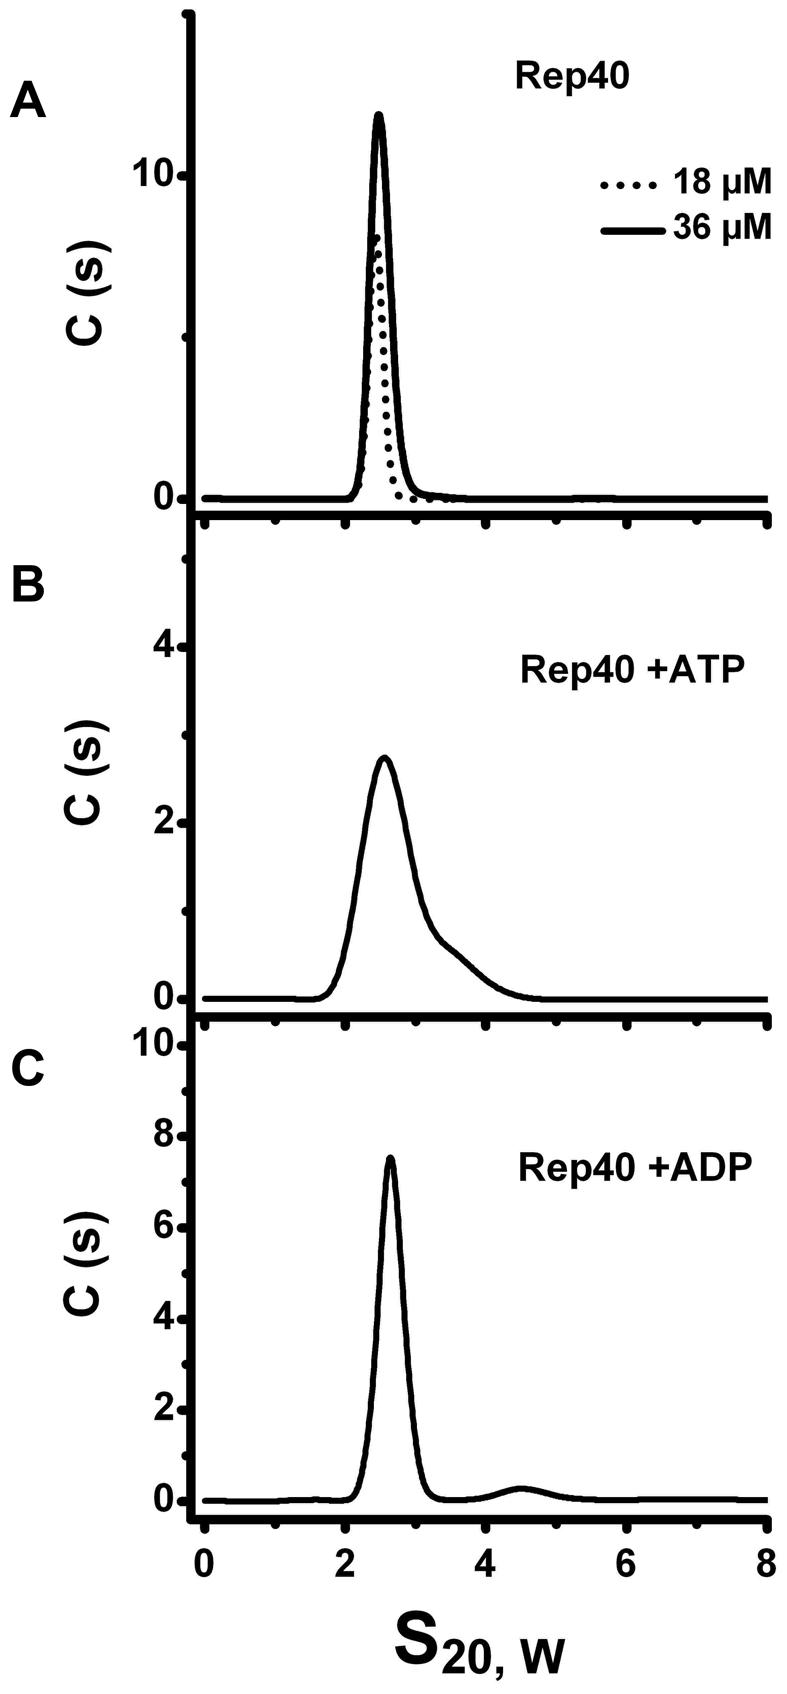 Sedimentation velocity profiles of Re40.